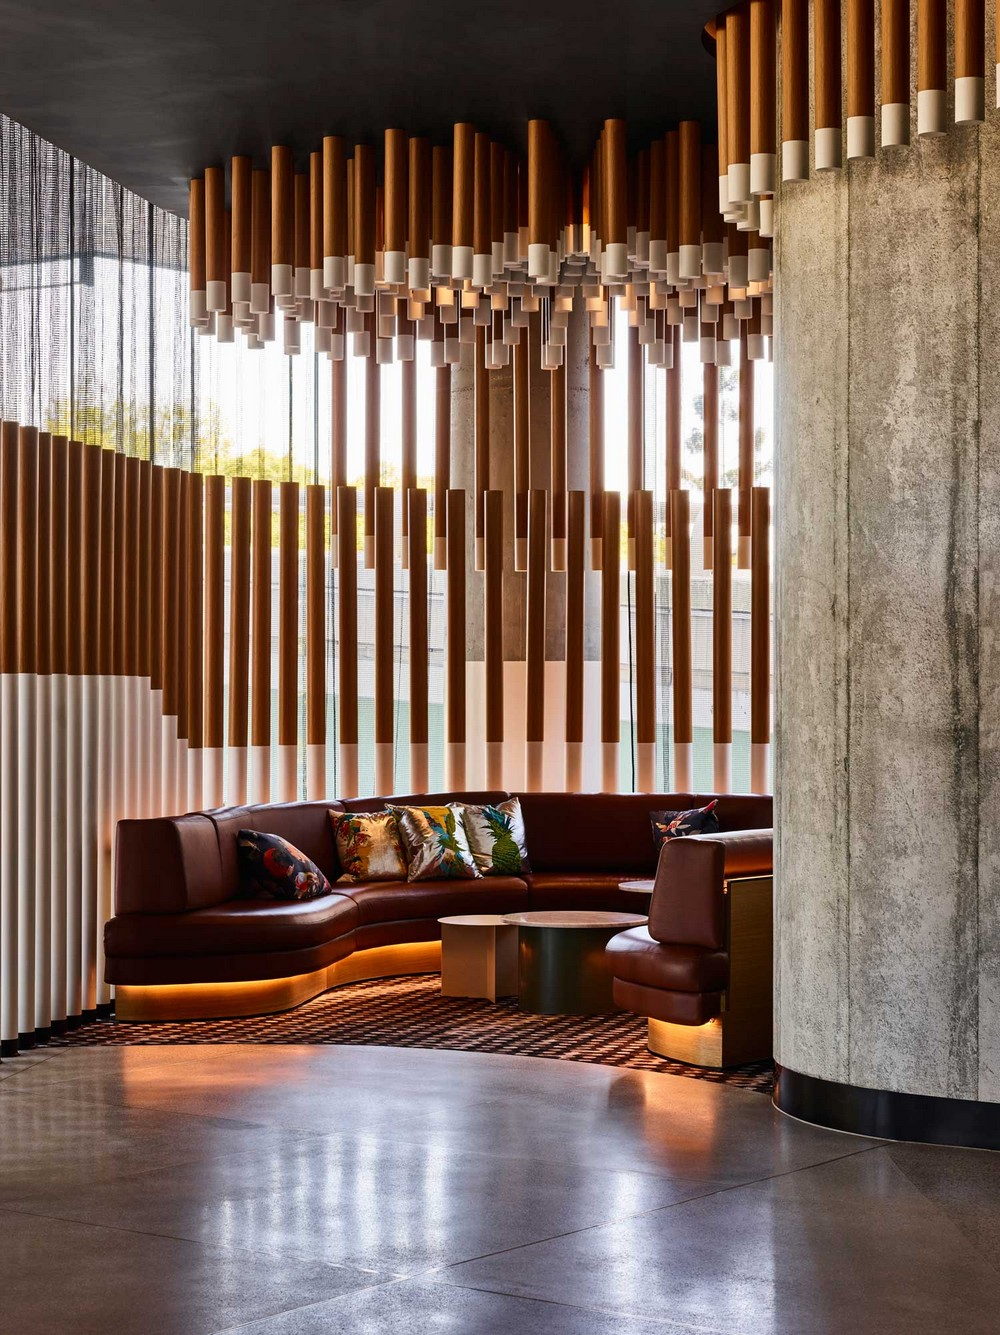 Top 20 Interior Designers From Sydney interior designers from sydney Top 20 Interior Designers From Sydney nic graham interior designer Design Hubs Of The World – Amazing Interior Designers From Sydney nic graham